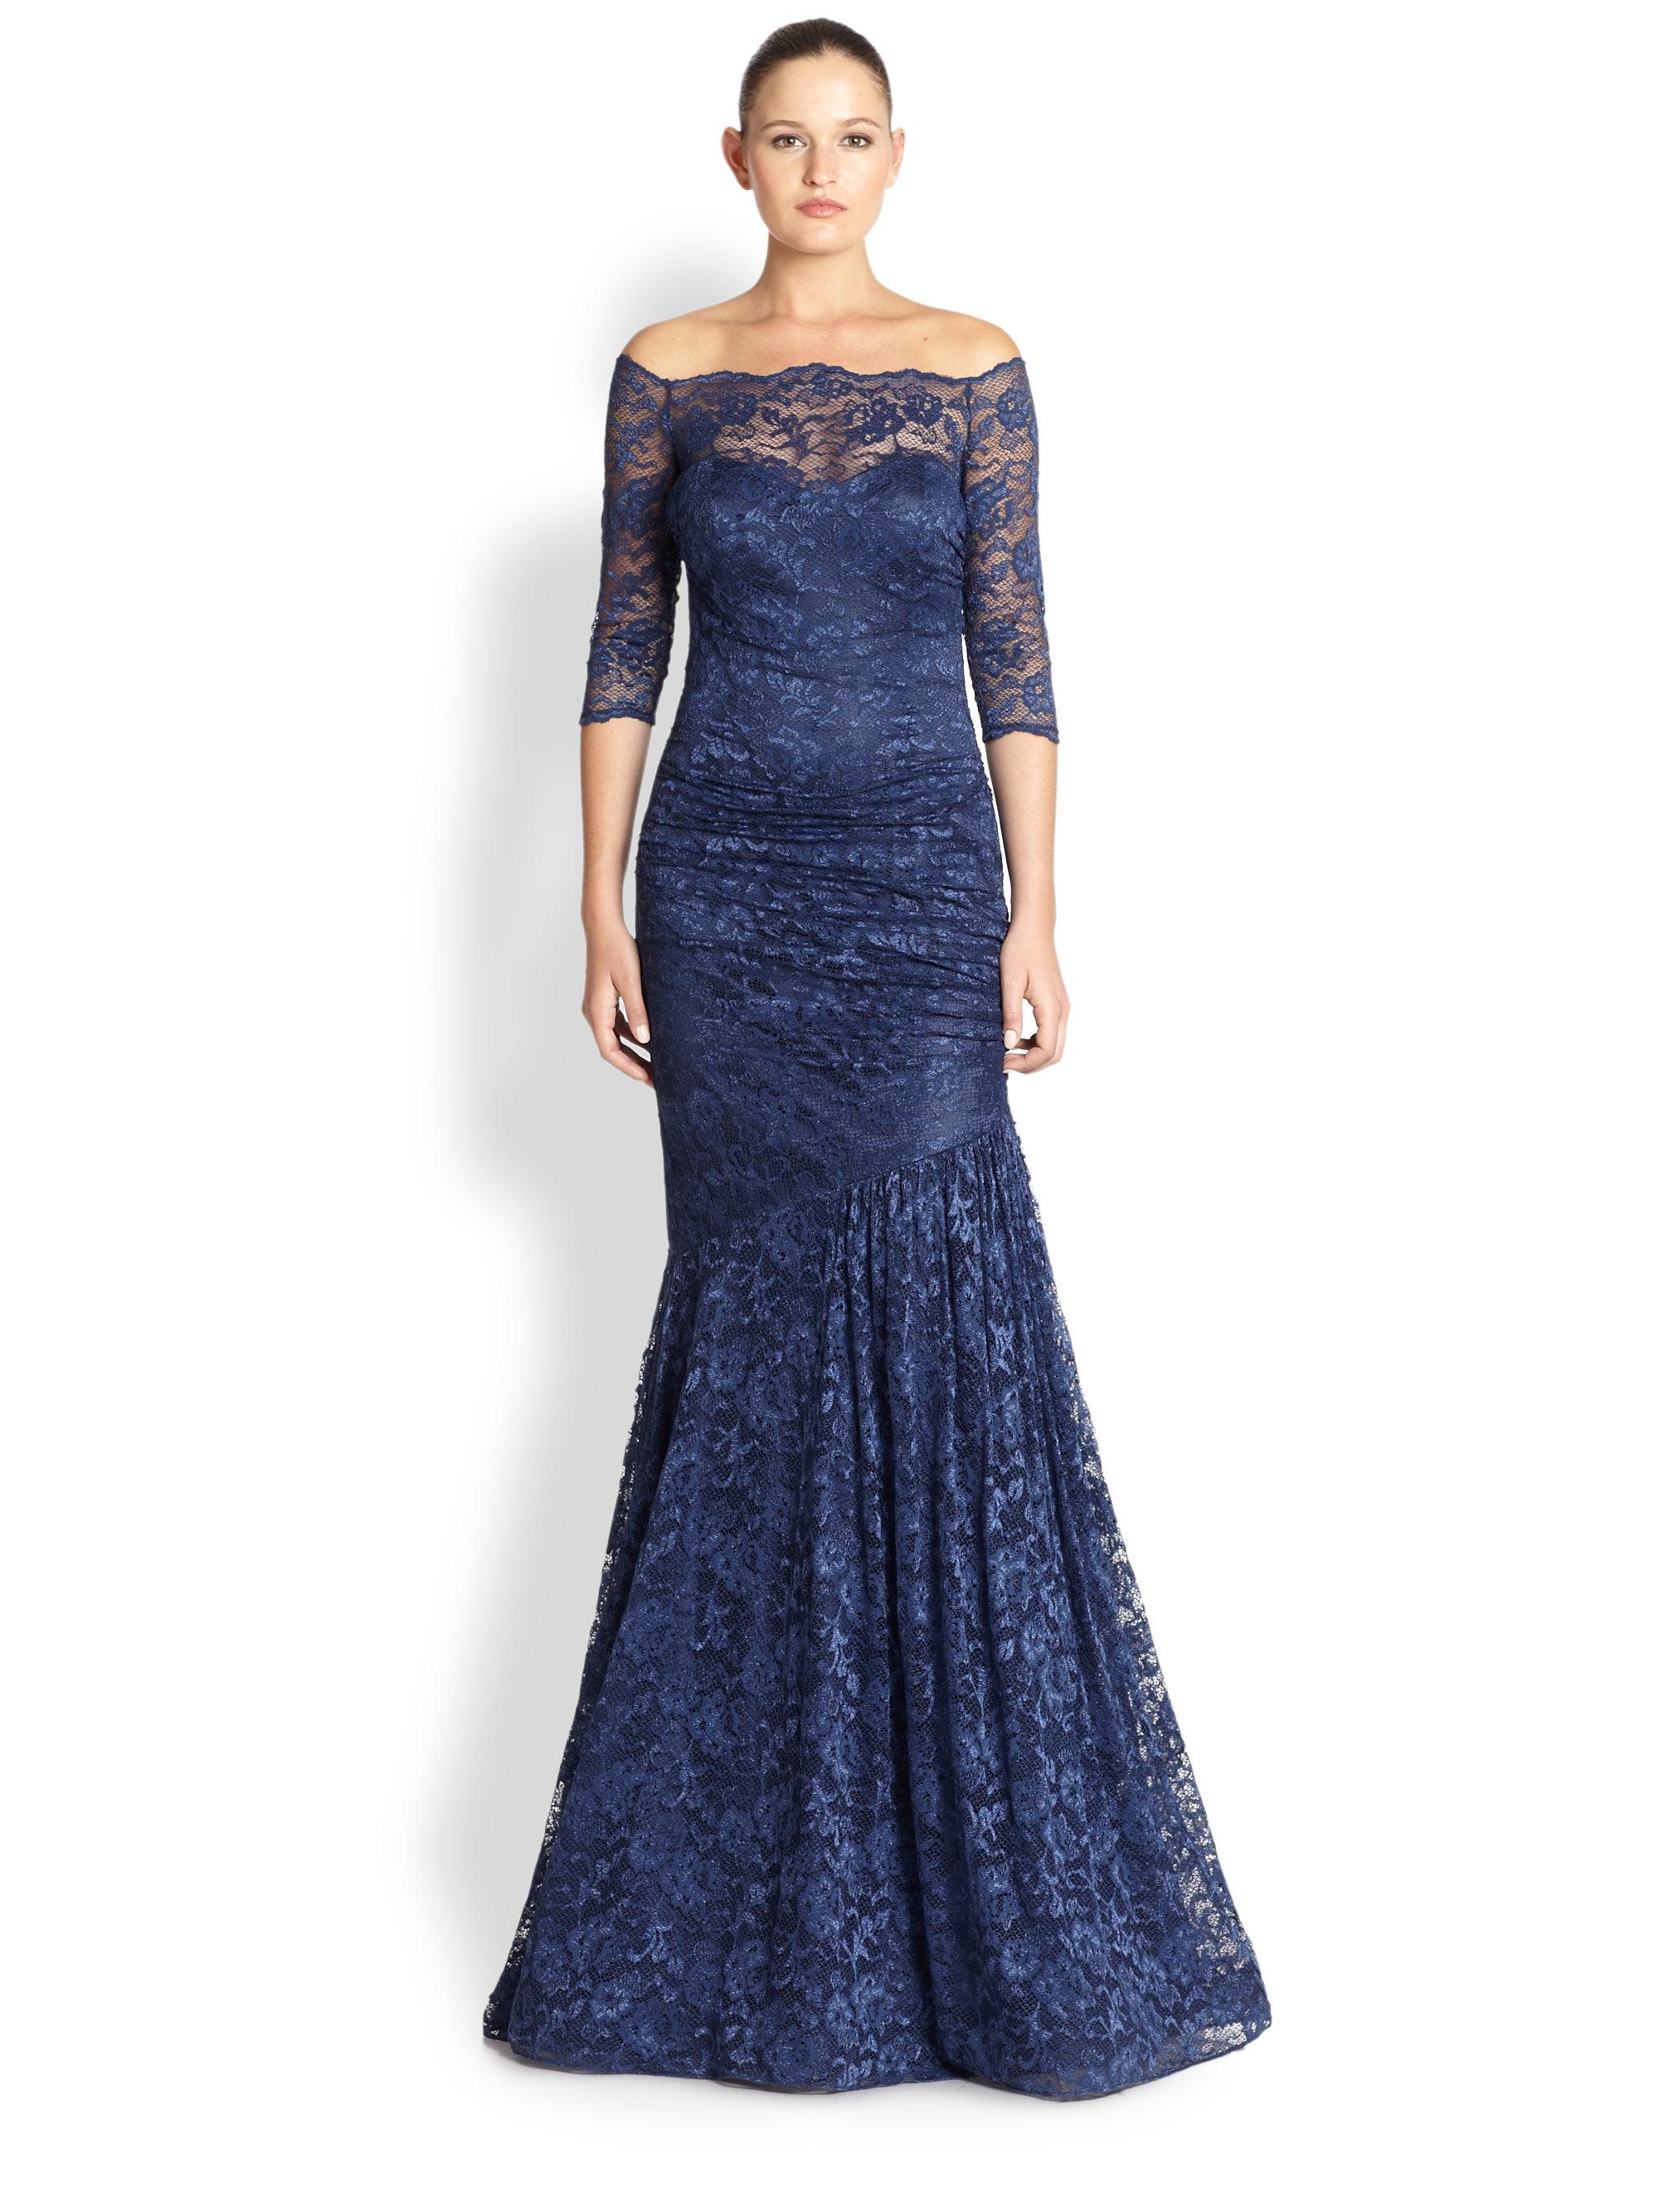 Lyst - Teri Jon Lace Off-Shoulder Gown in Blue